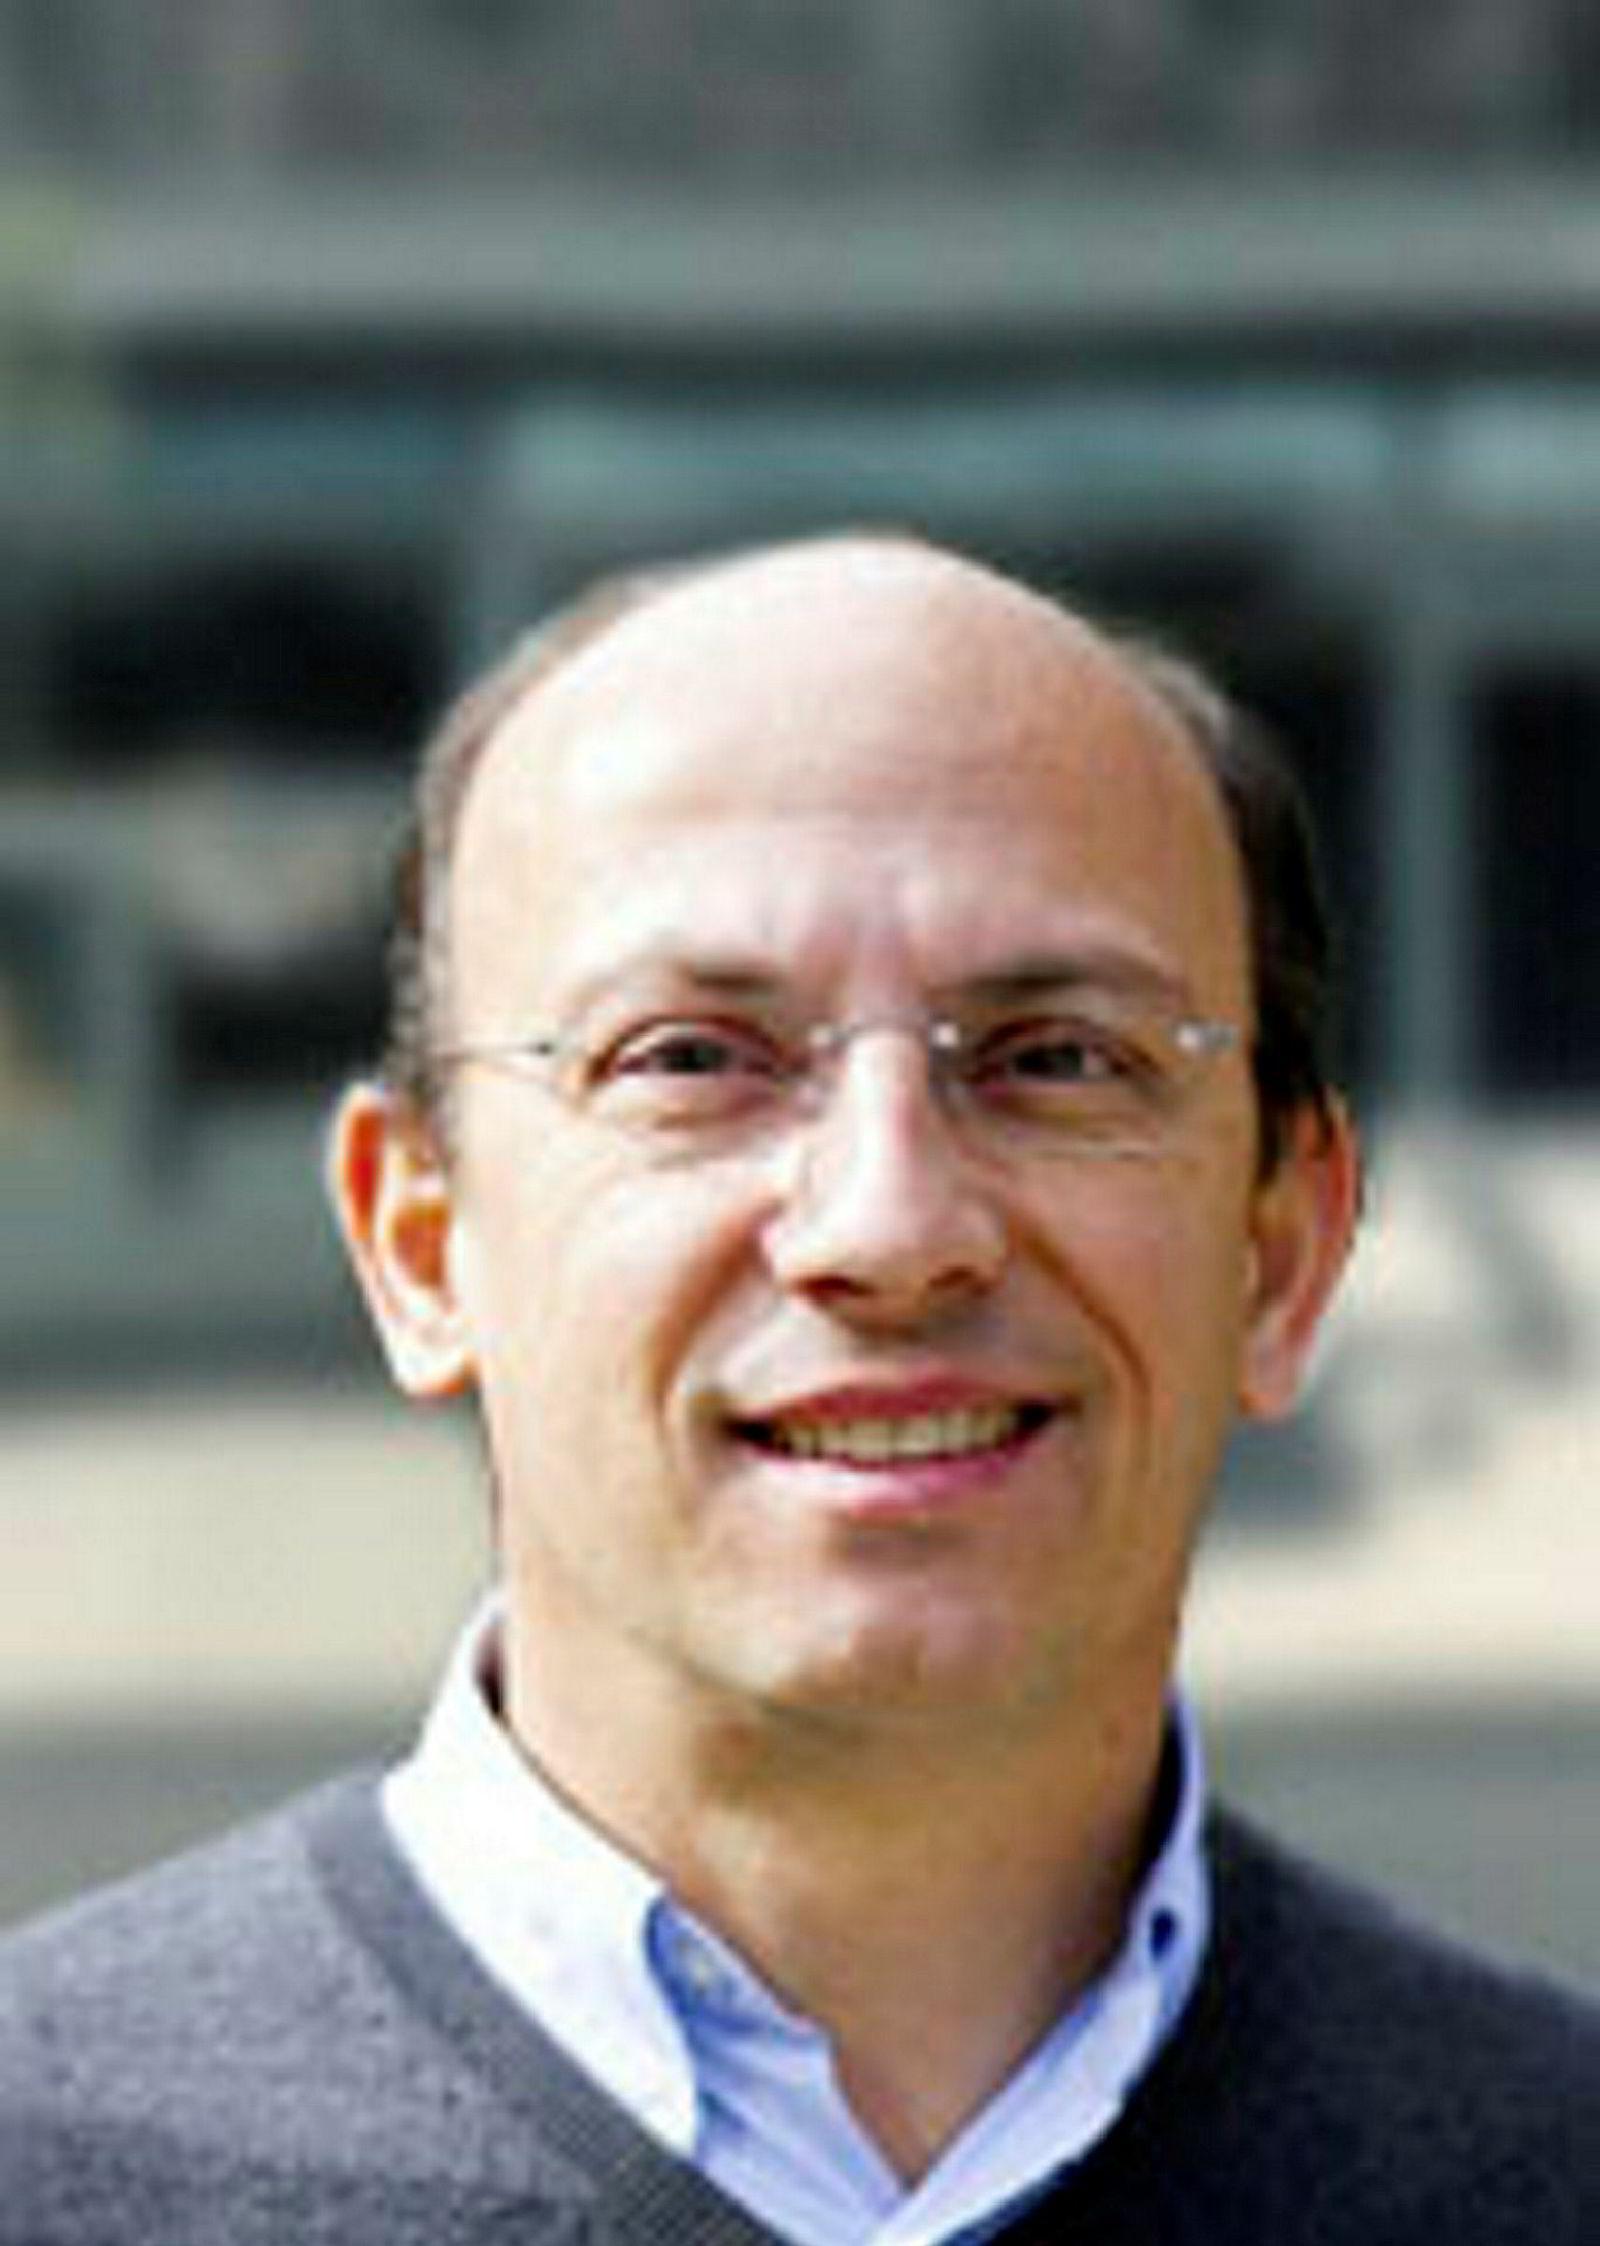 Xavier Ballart professor i statsvitenskap ved Universitat Autònoma de Barcelona.